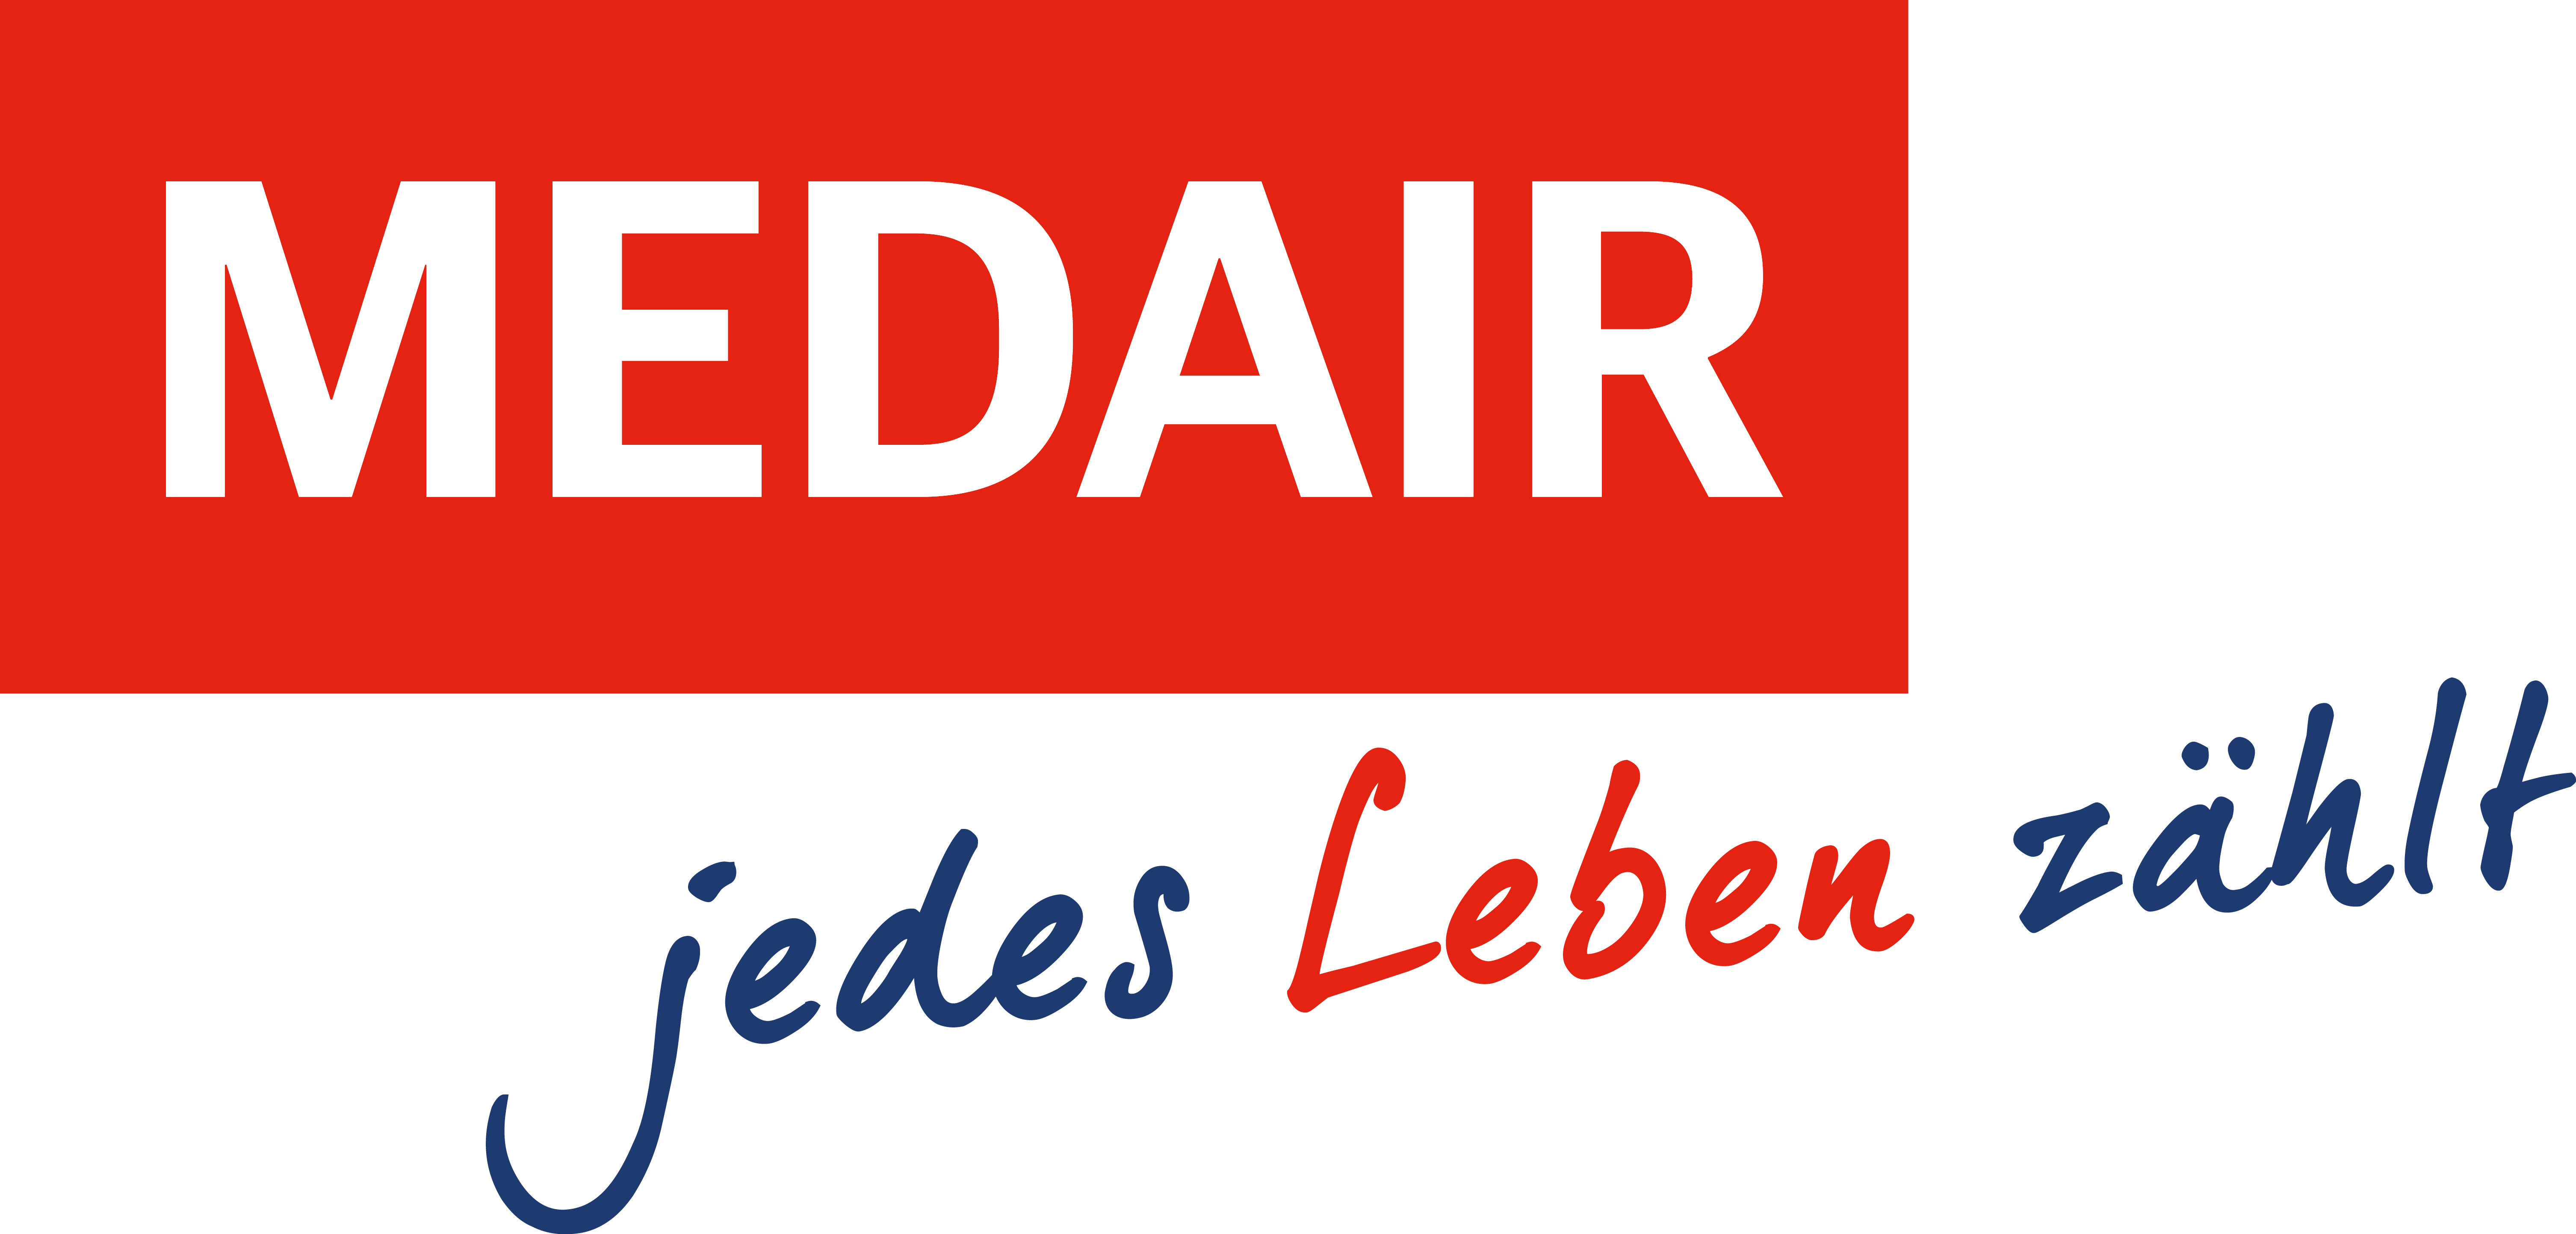 logo-with-colour-tagline-de-2019_01_23-16_23_19-utc